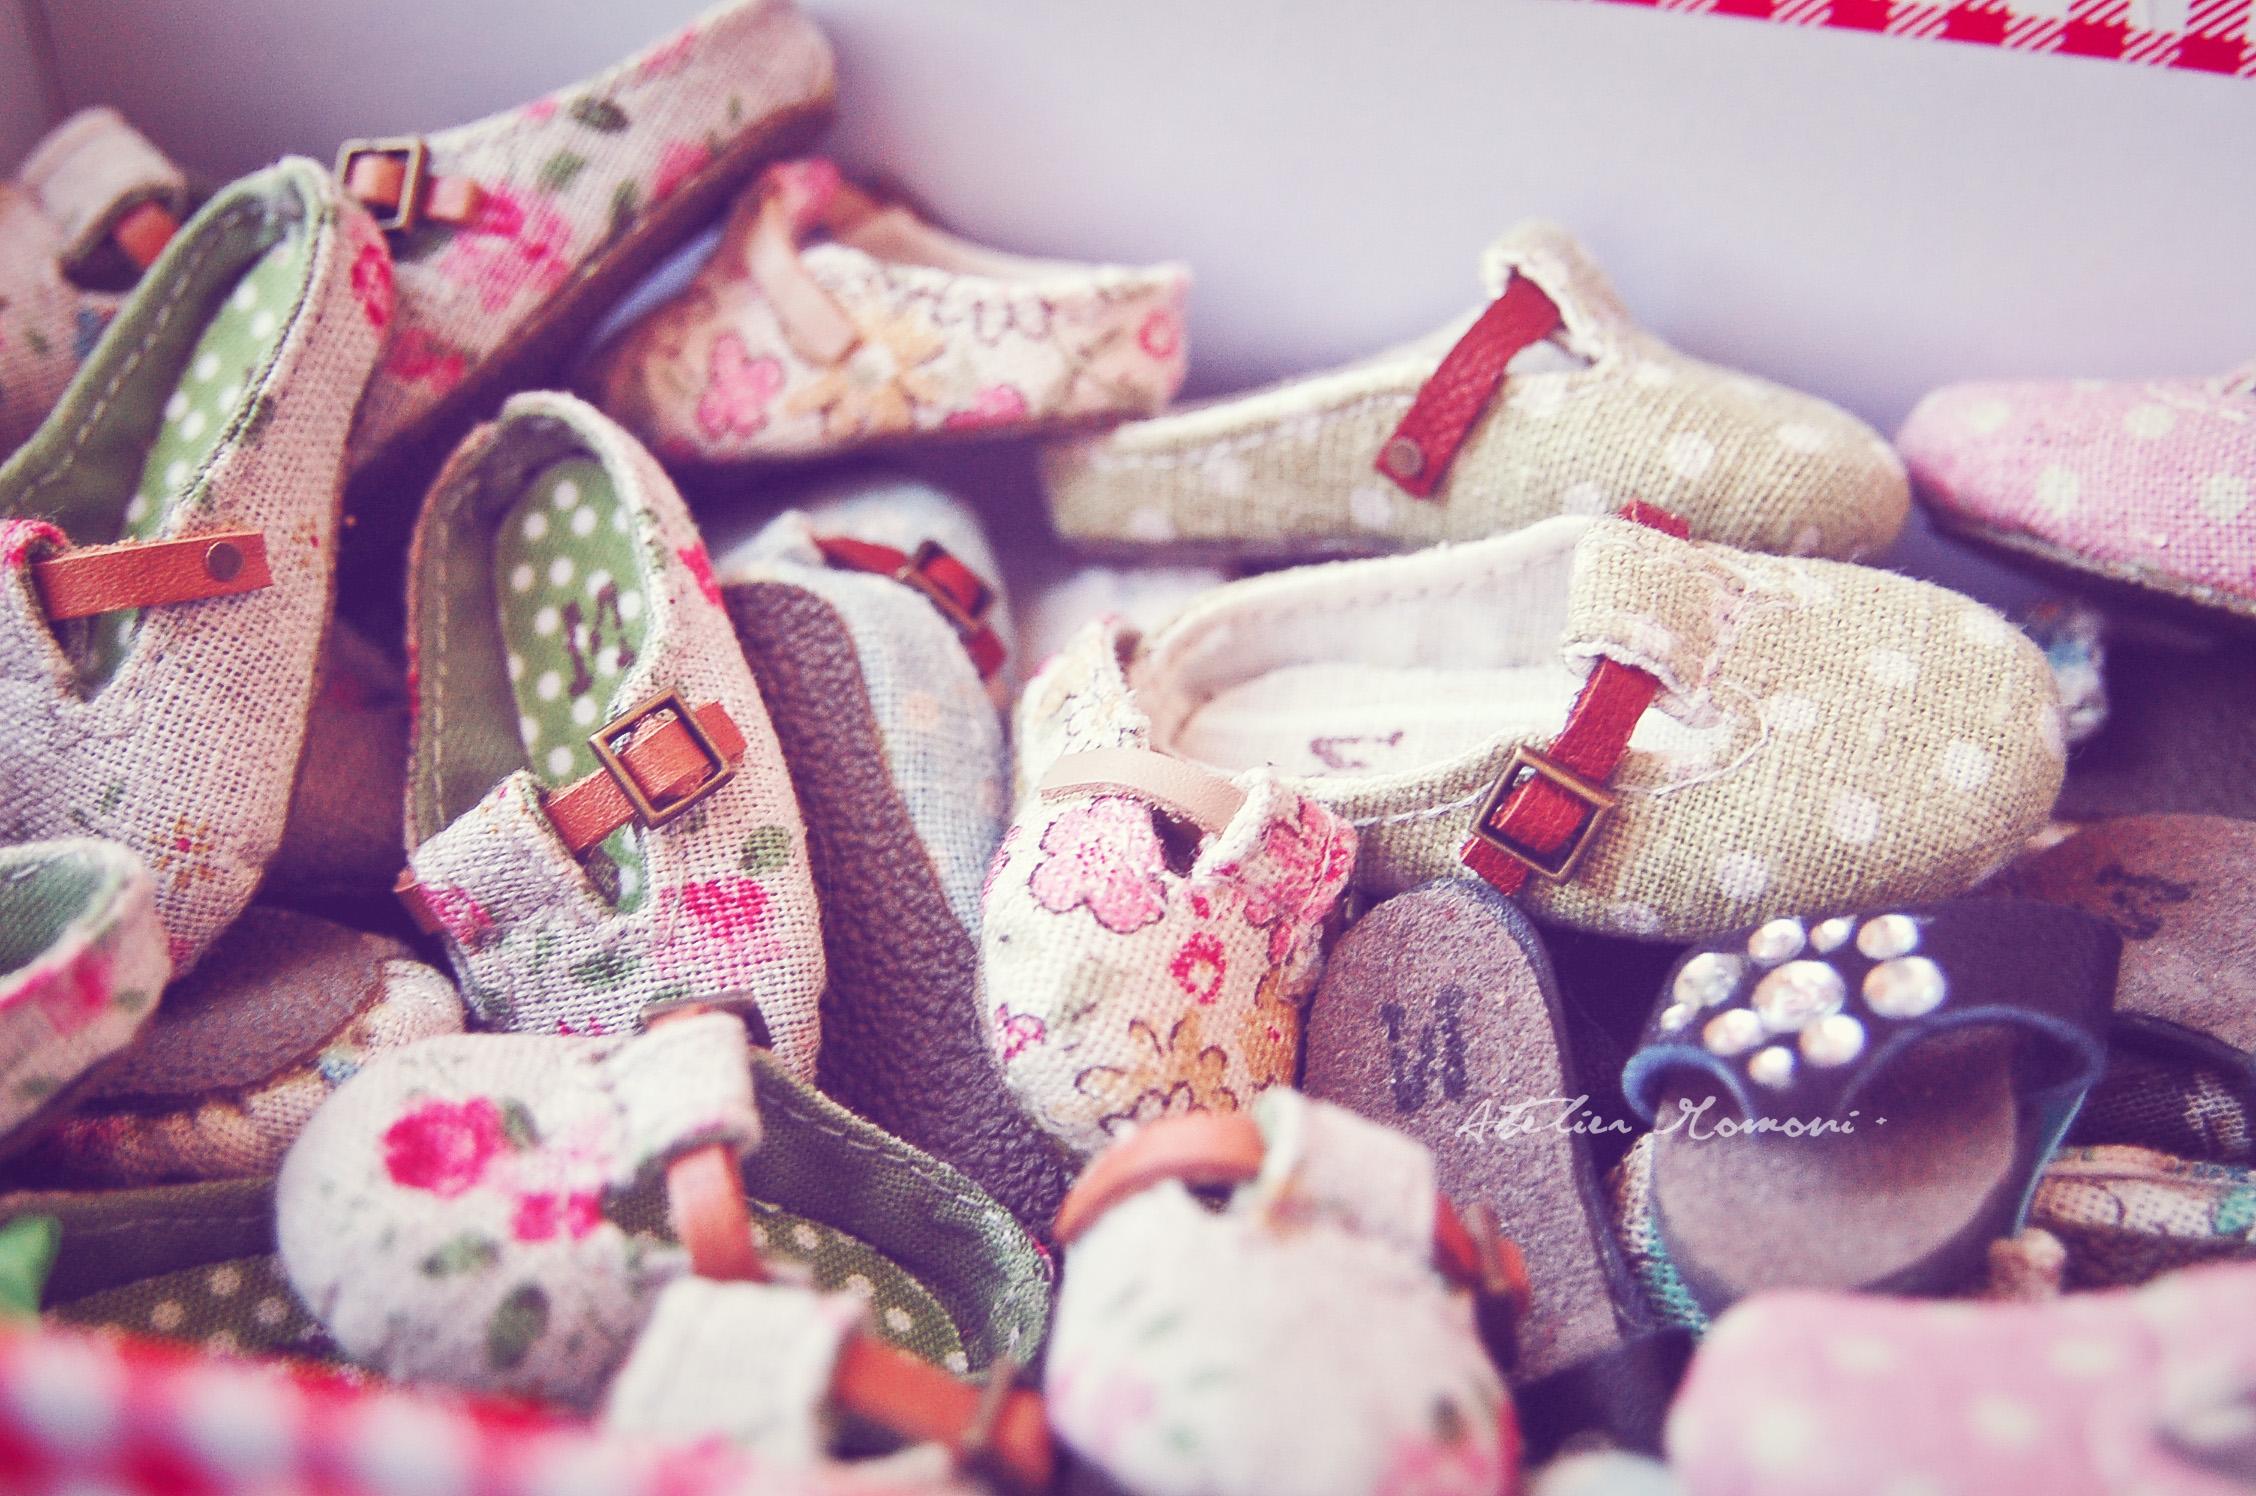 Wallpaper Shoes Pink Accesories Petal Shoe Textile Sweetness Accessorize Ateliermomoni Birkenstock